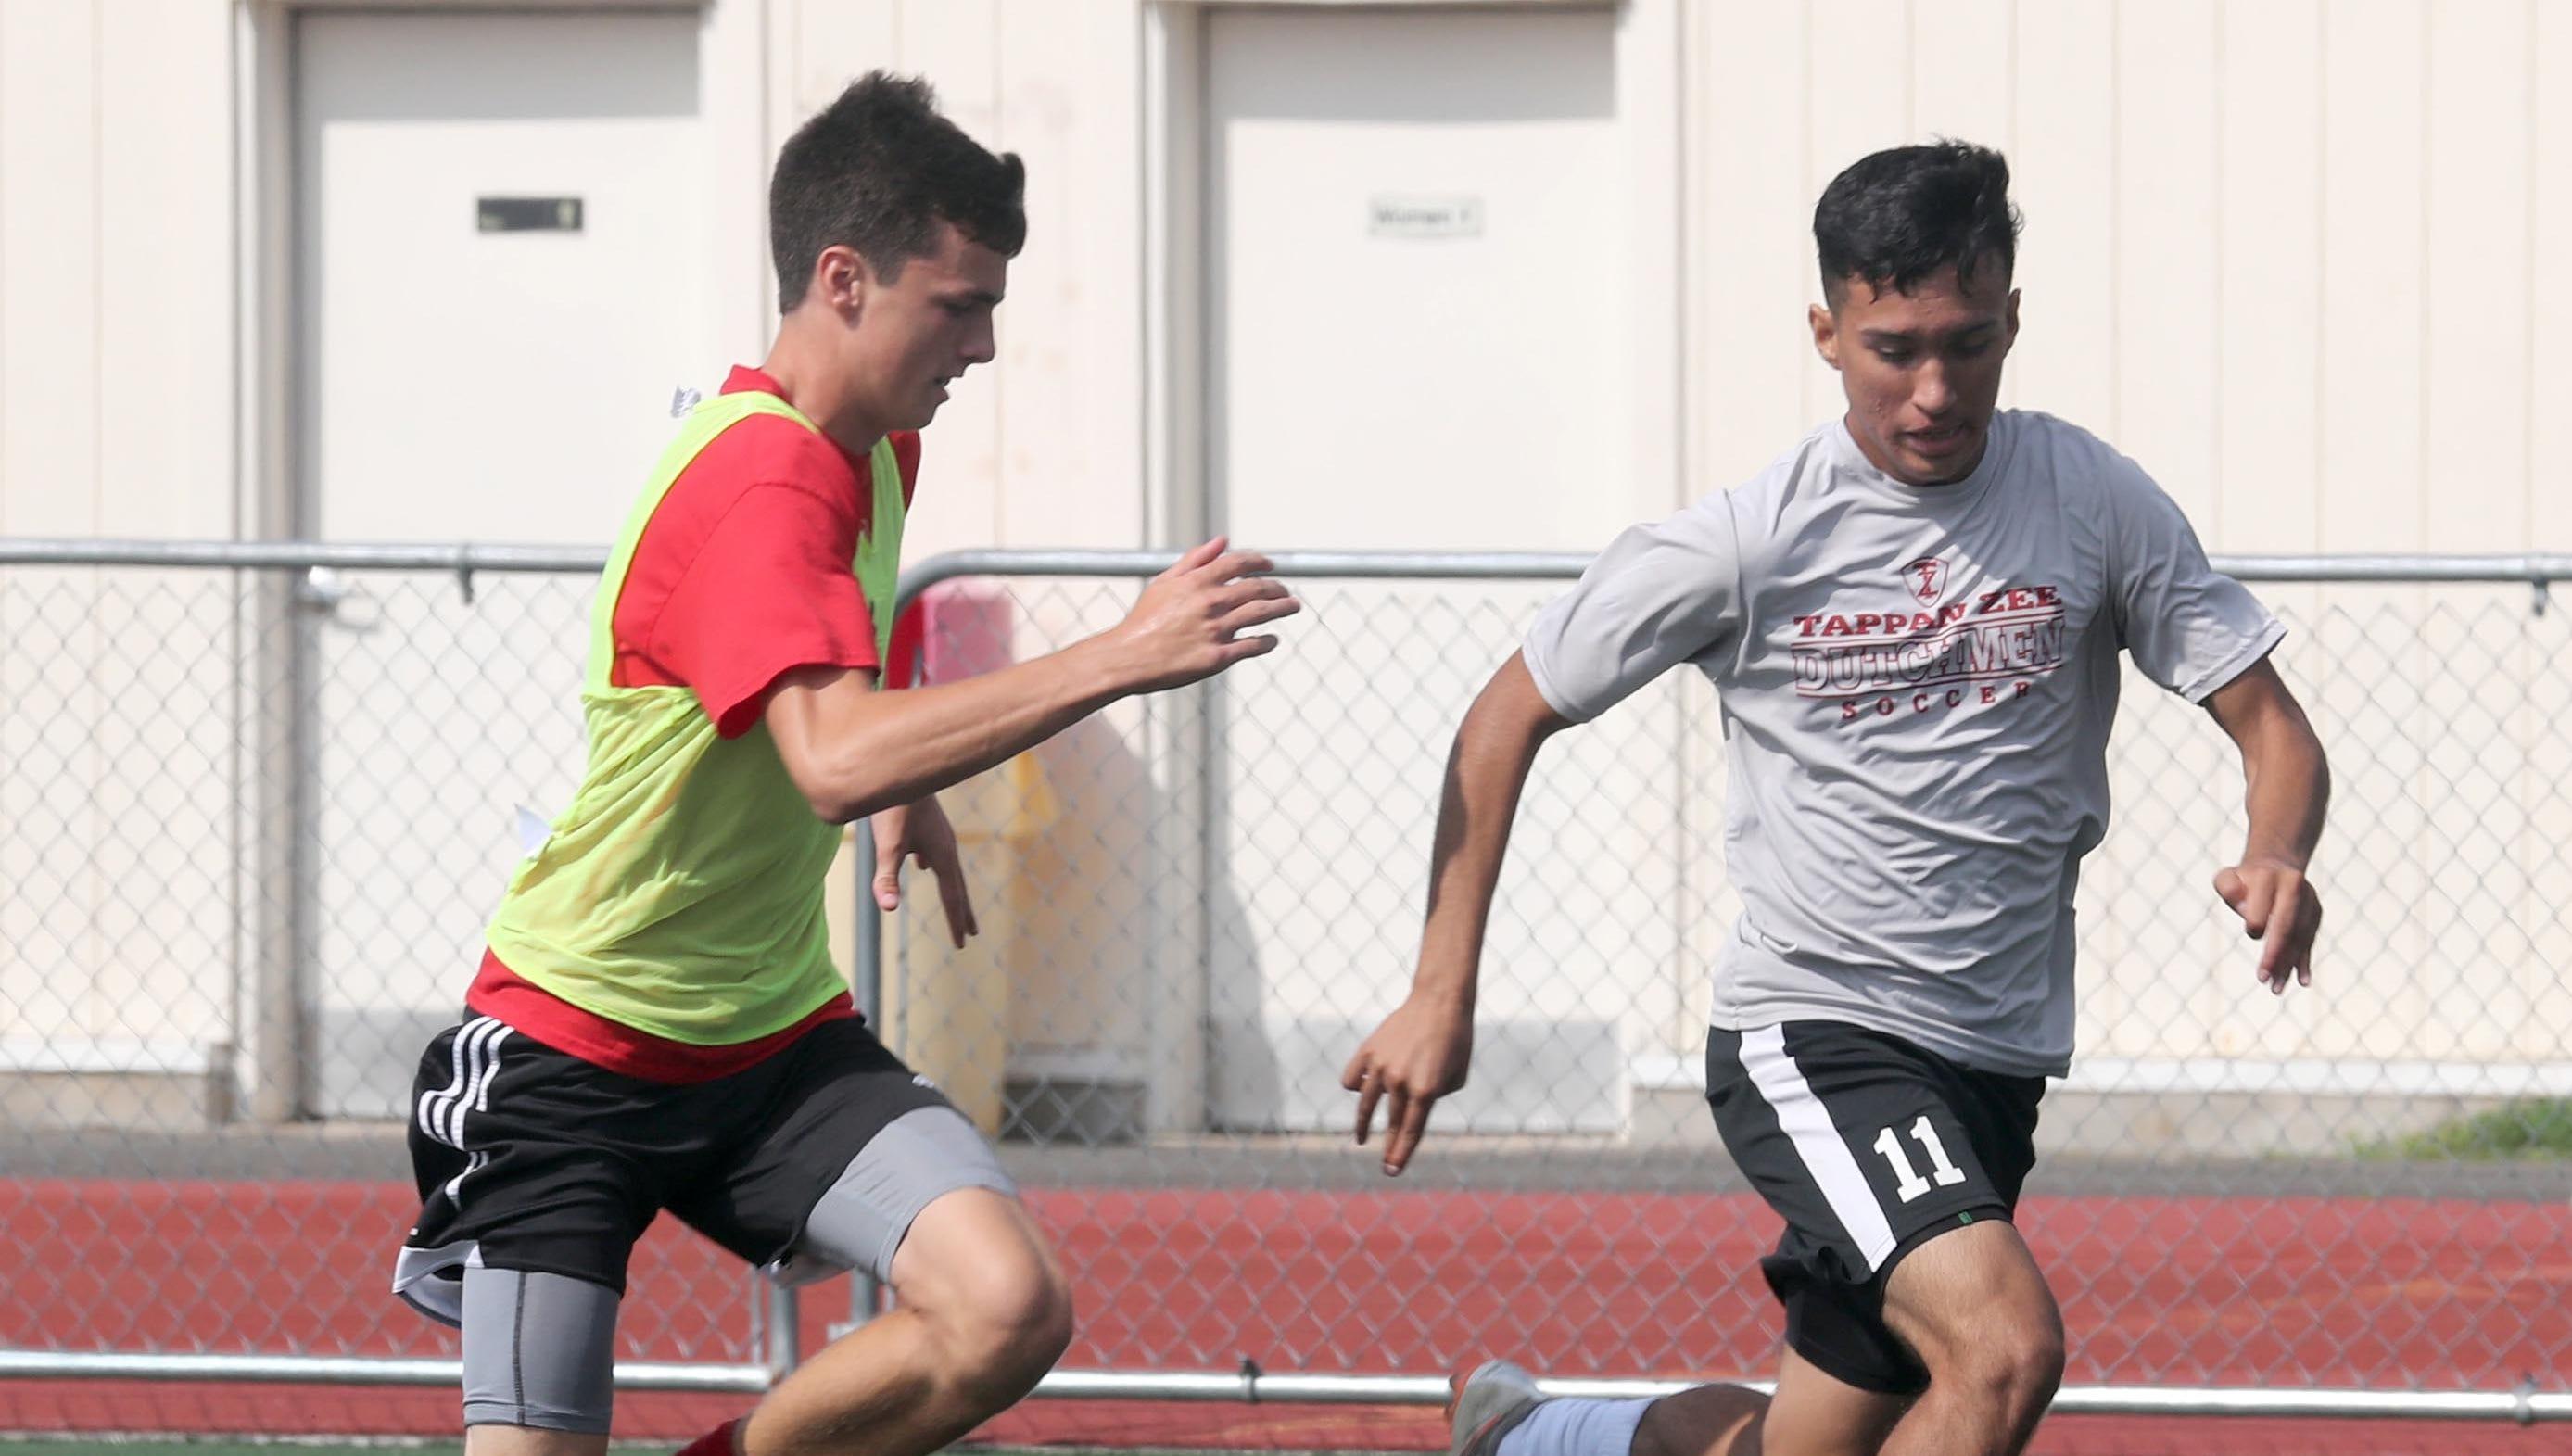 Boys soccer: Rockland County features elite goal-scorers heading into 2018 season